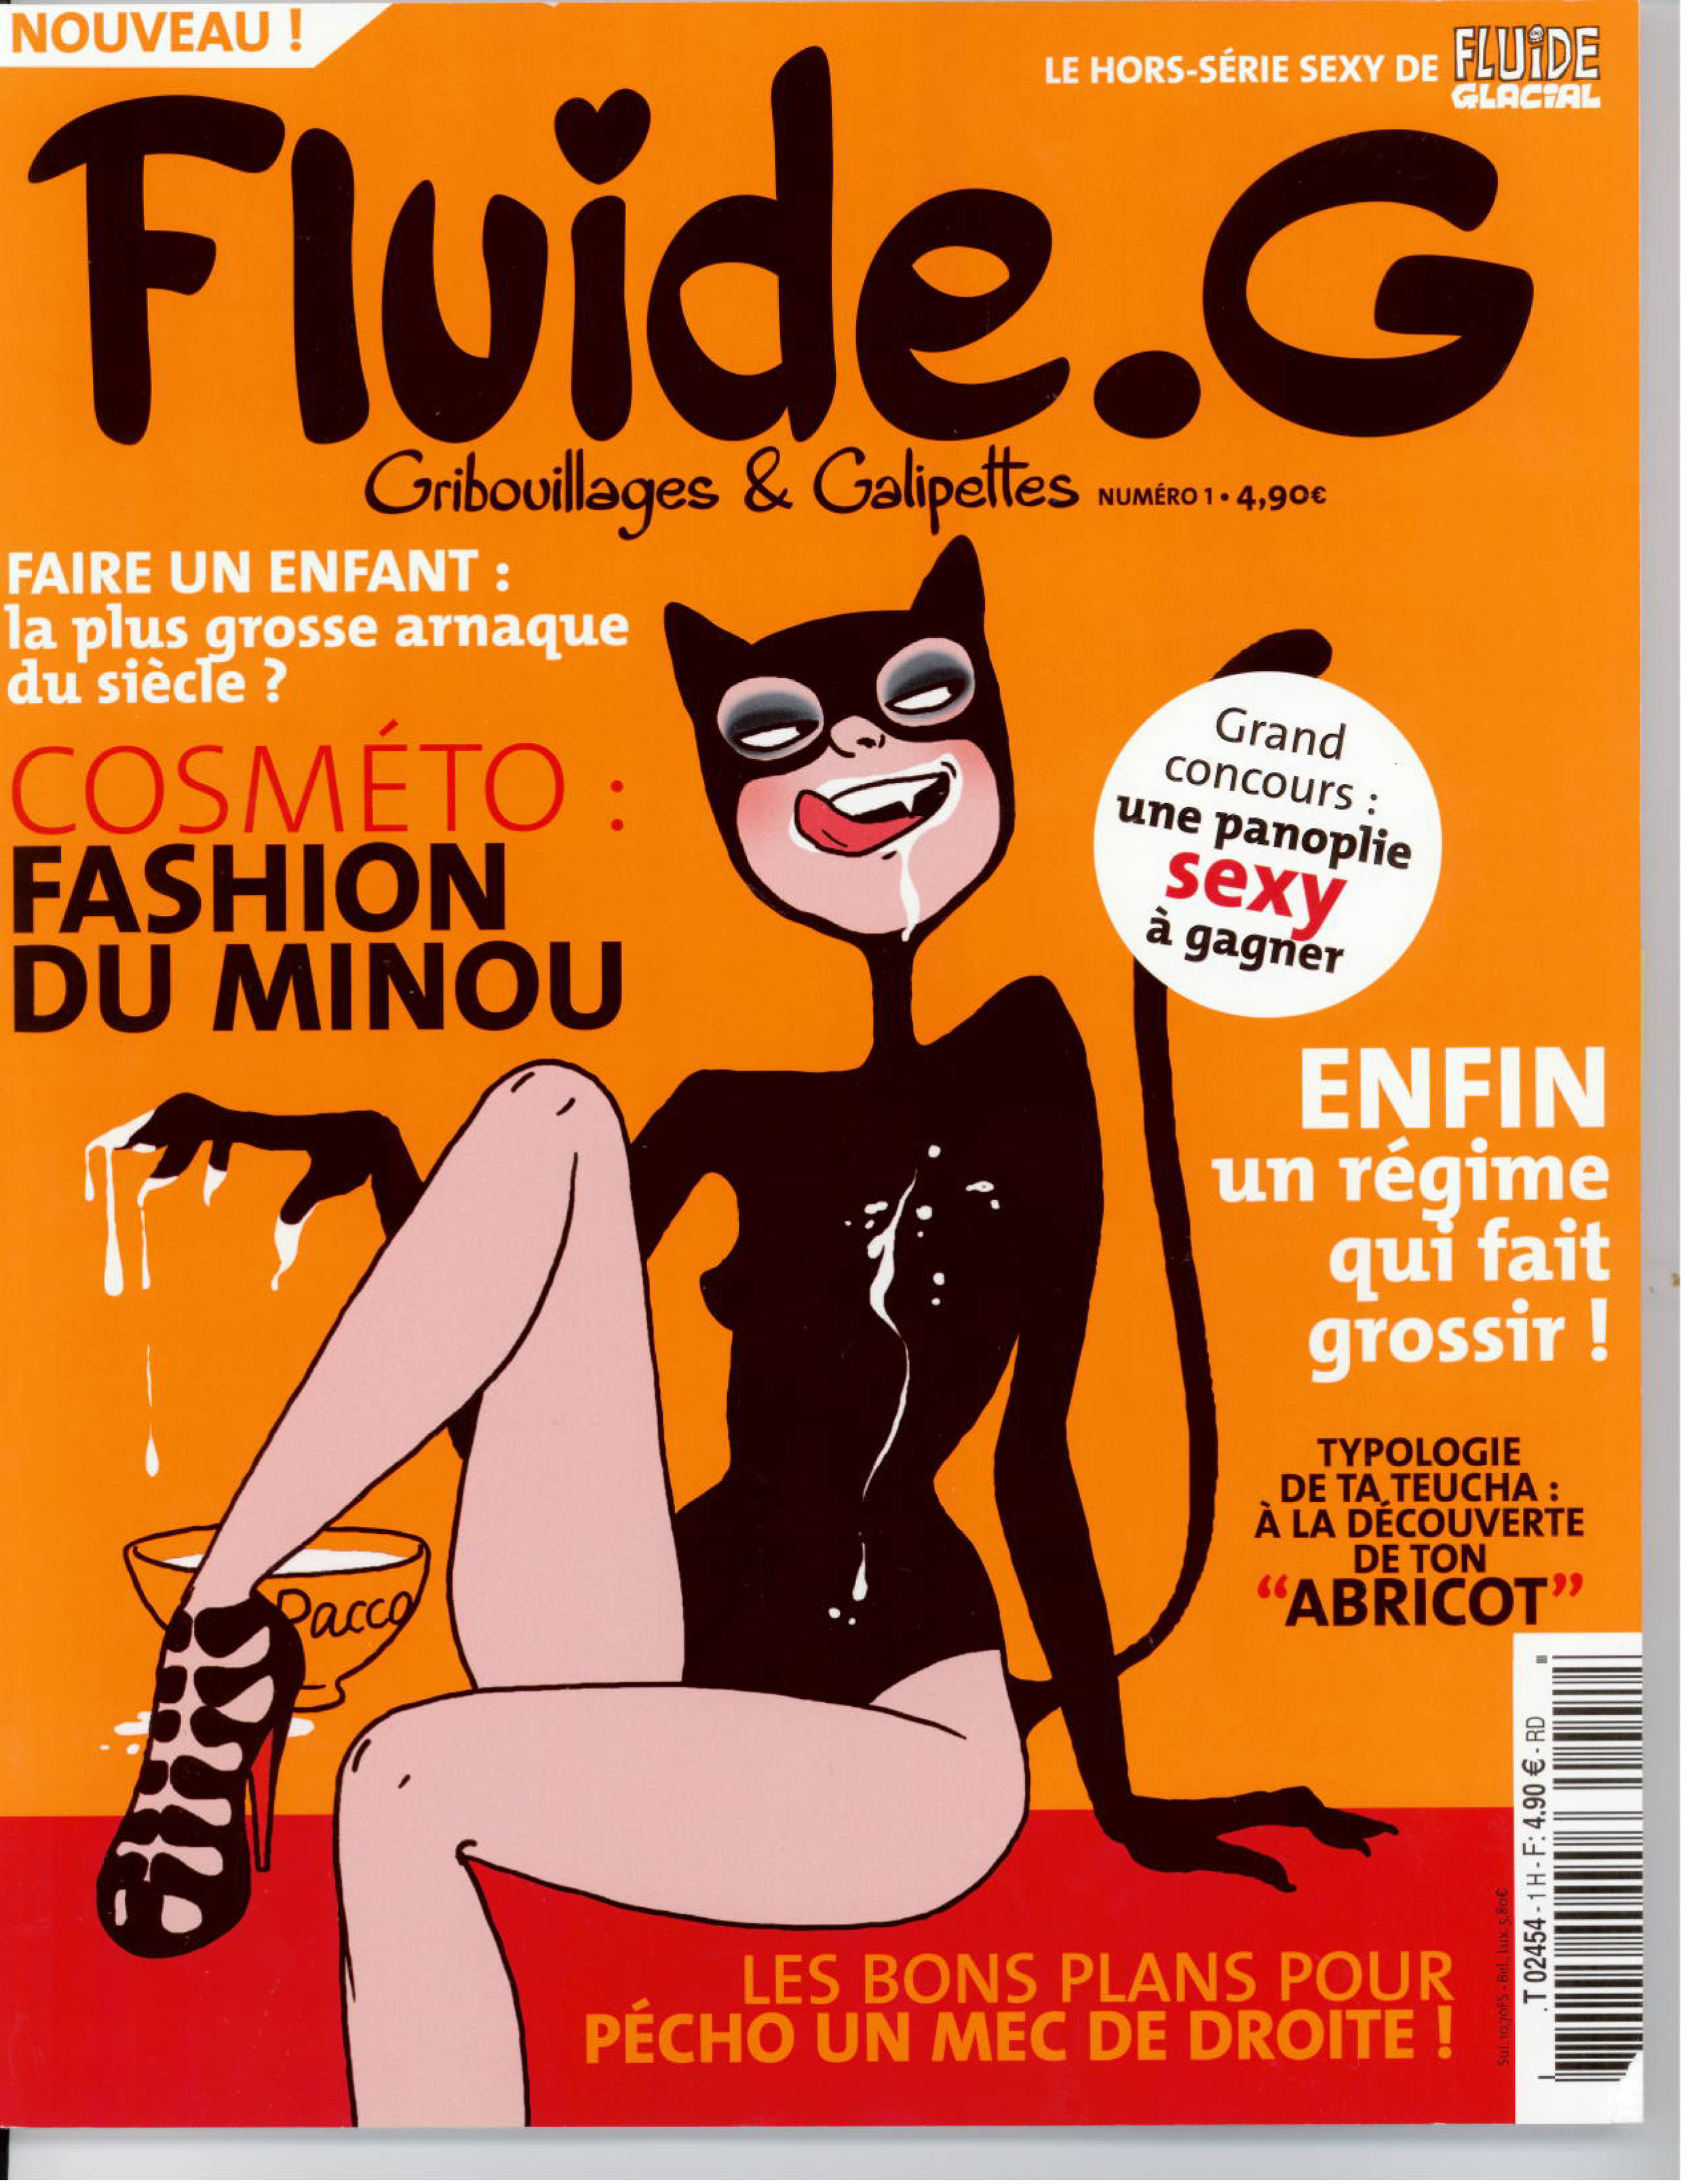 Fluid.G Magazine Feature Article -